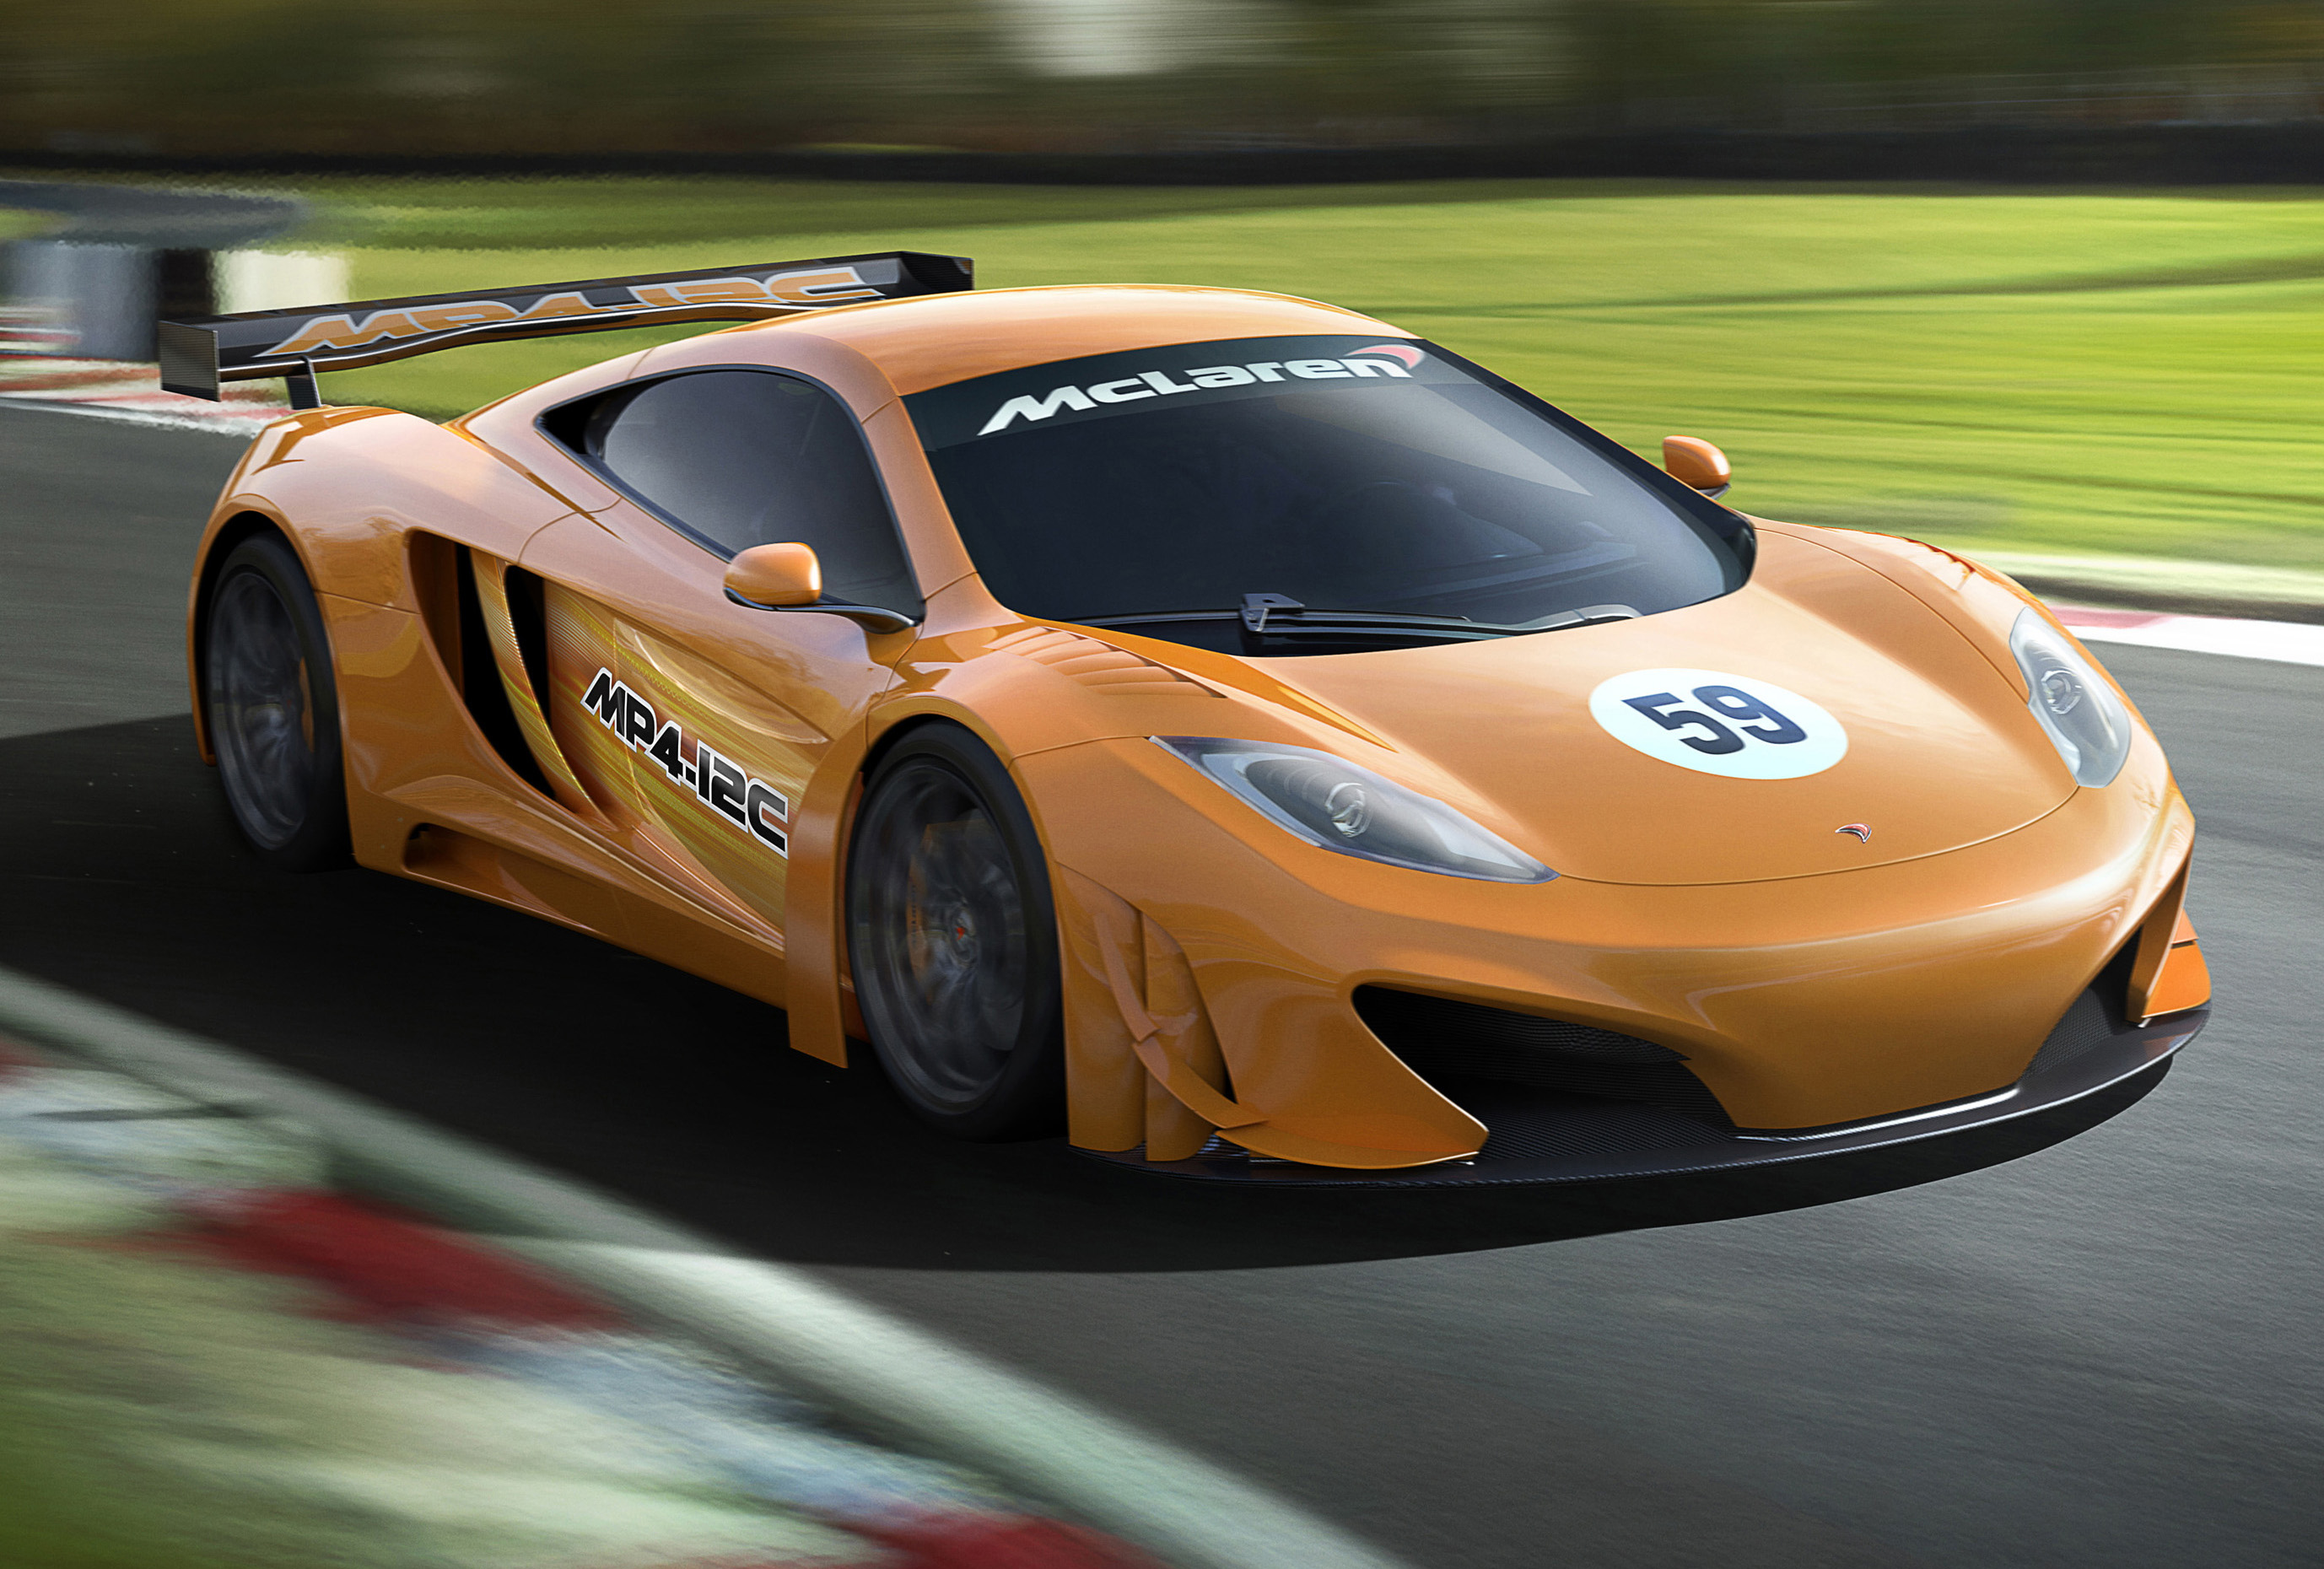 cgi-of-new-mclaren-mp4-12c-gt3-racing-car-free-hd-wallpapers